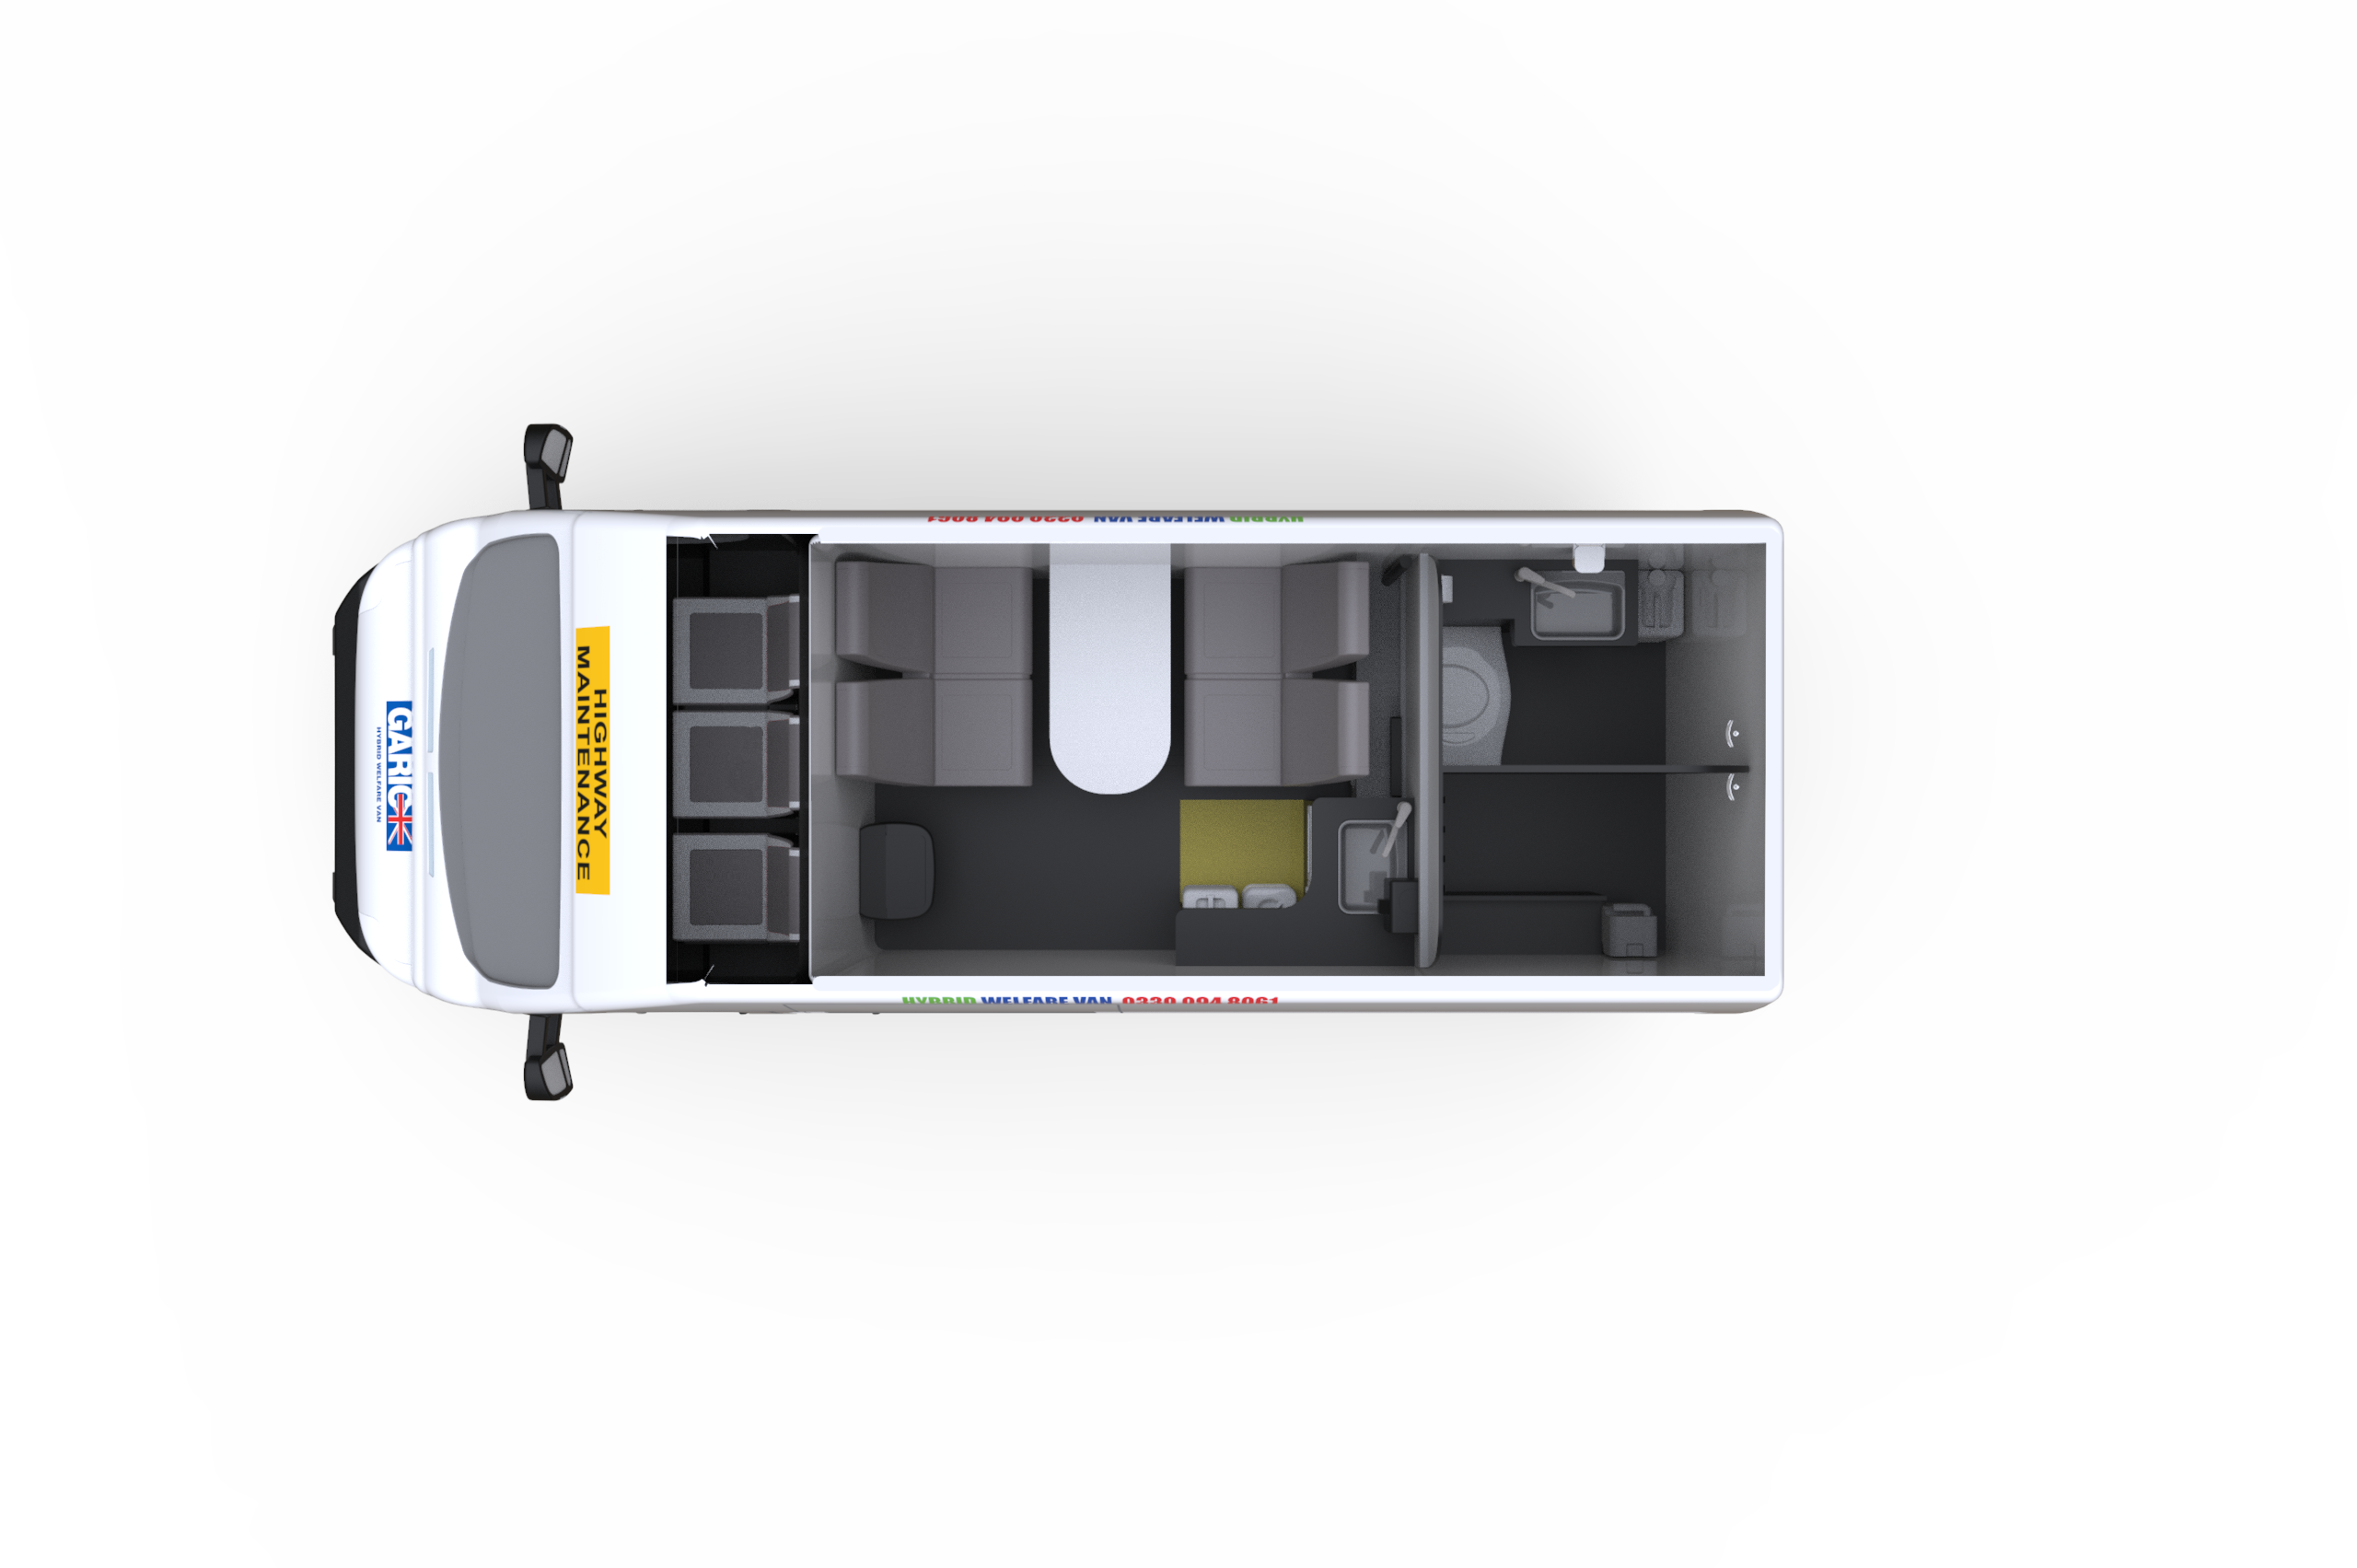 Hybrid Welfare Van-304